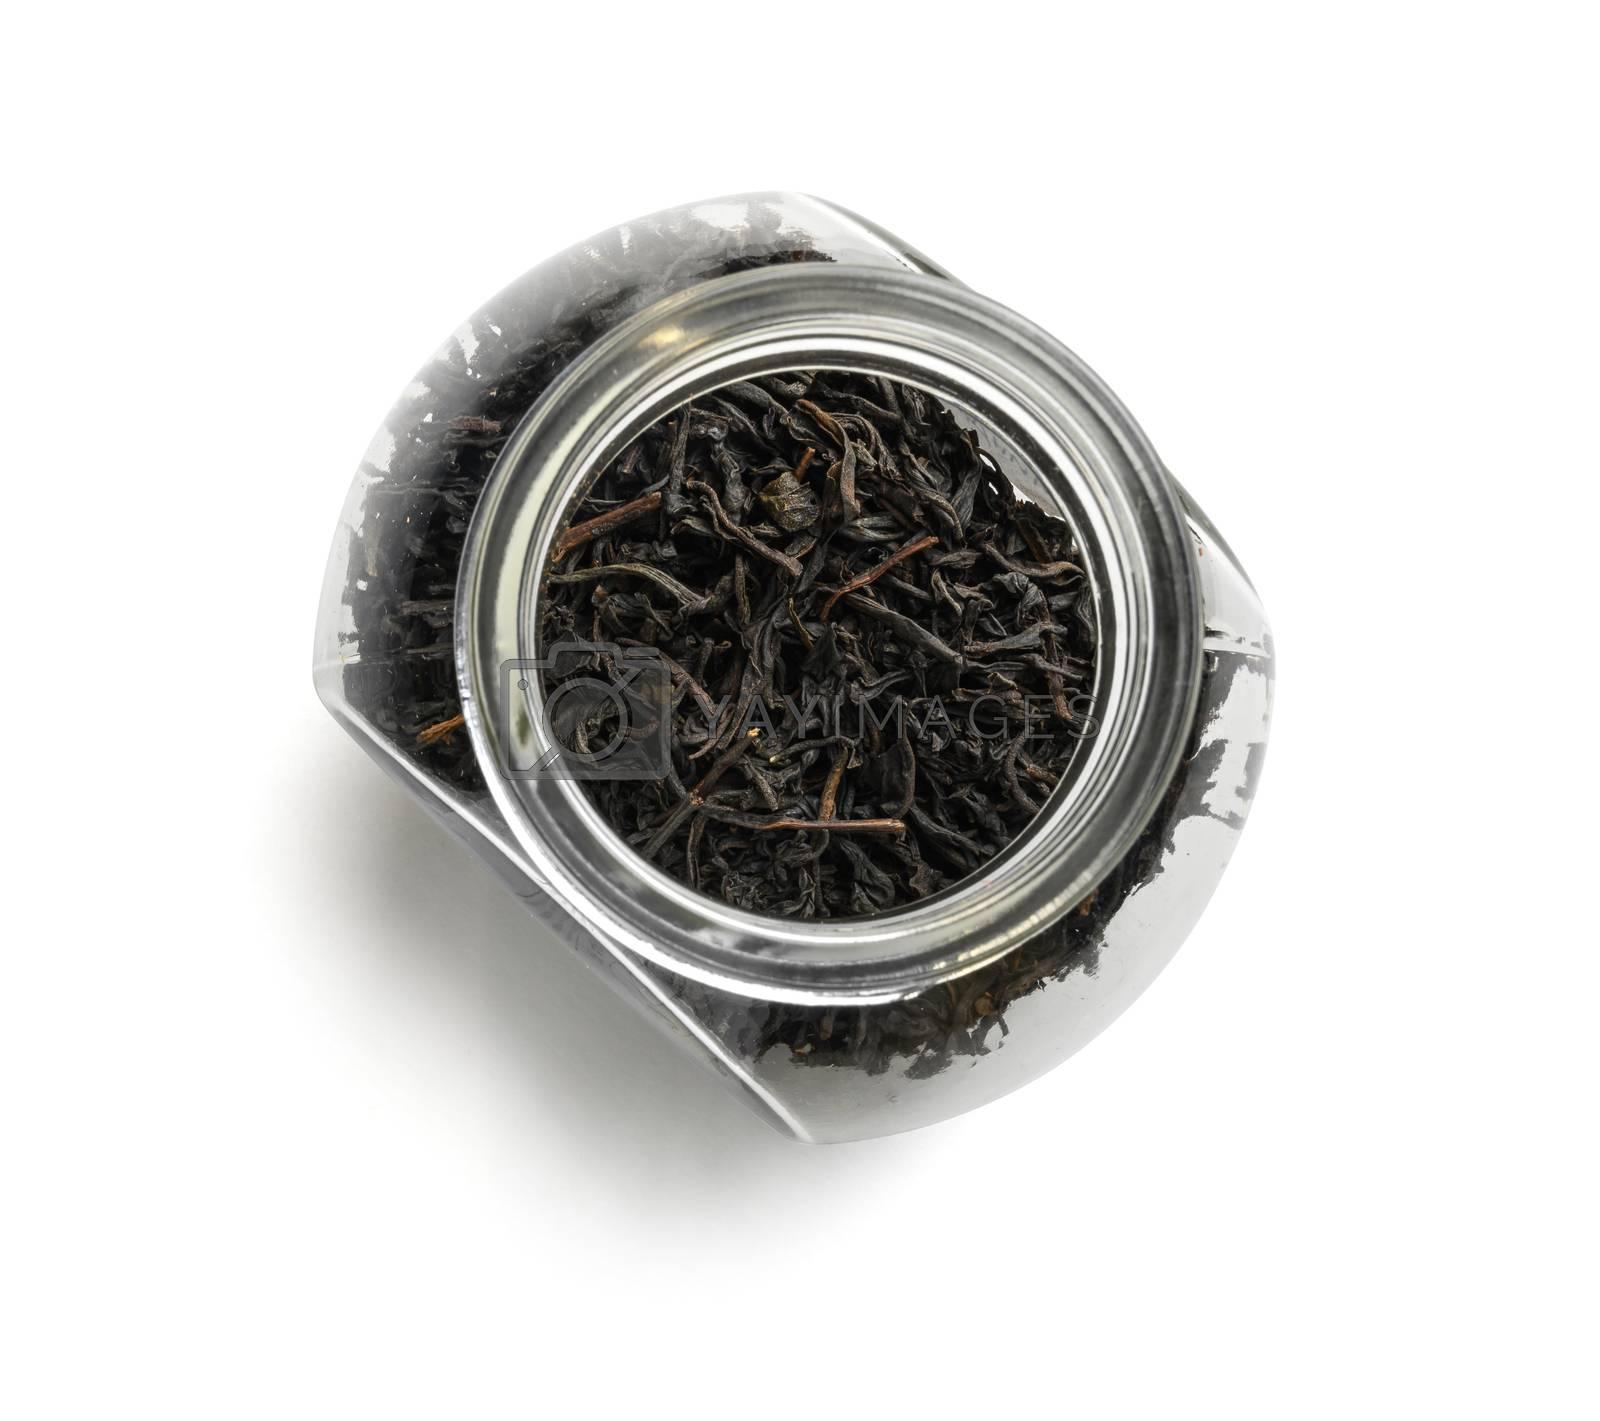 Black tea top view on white background.